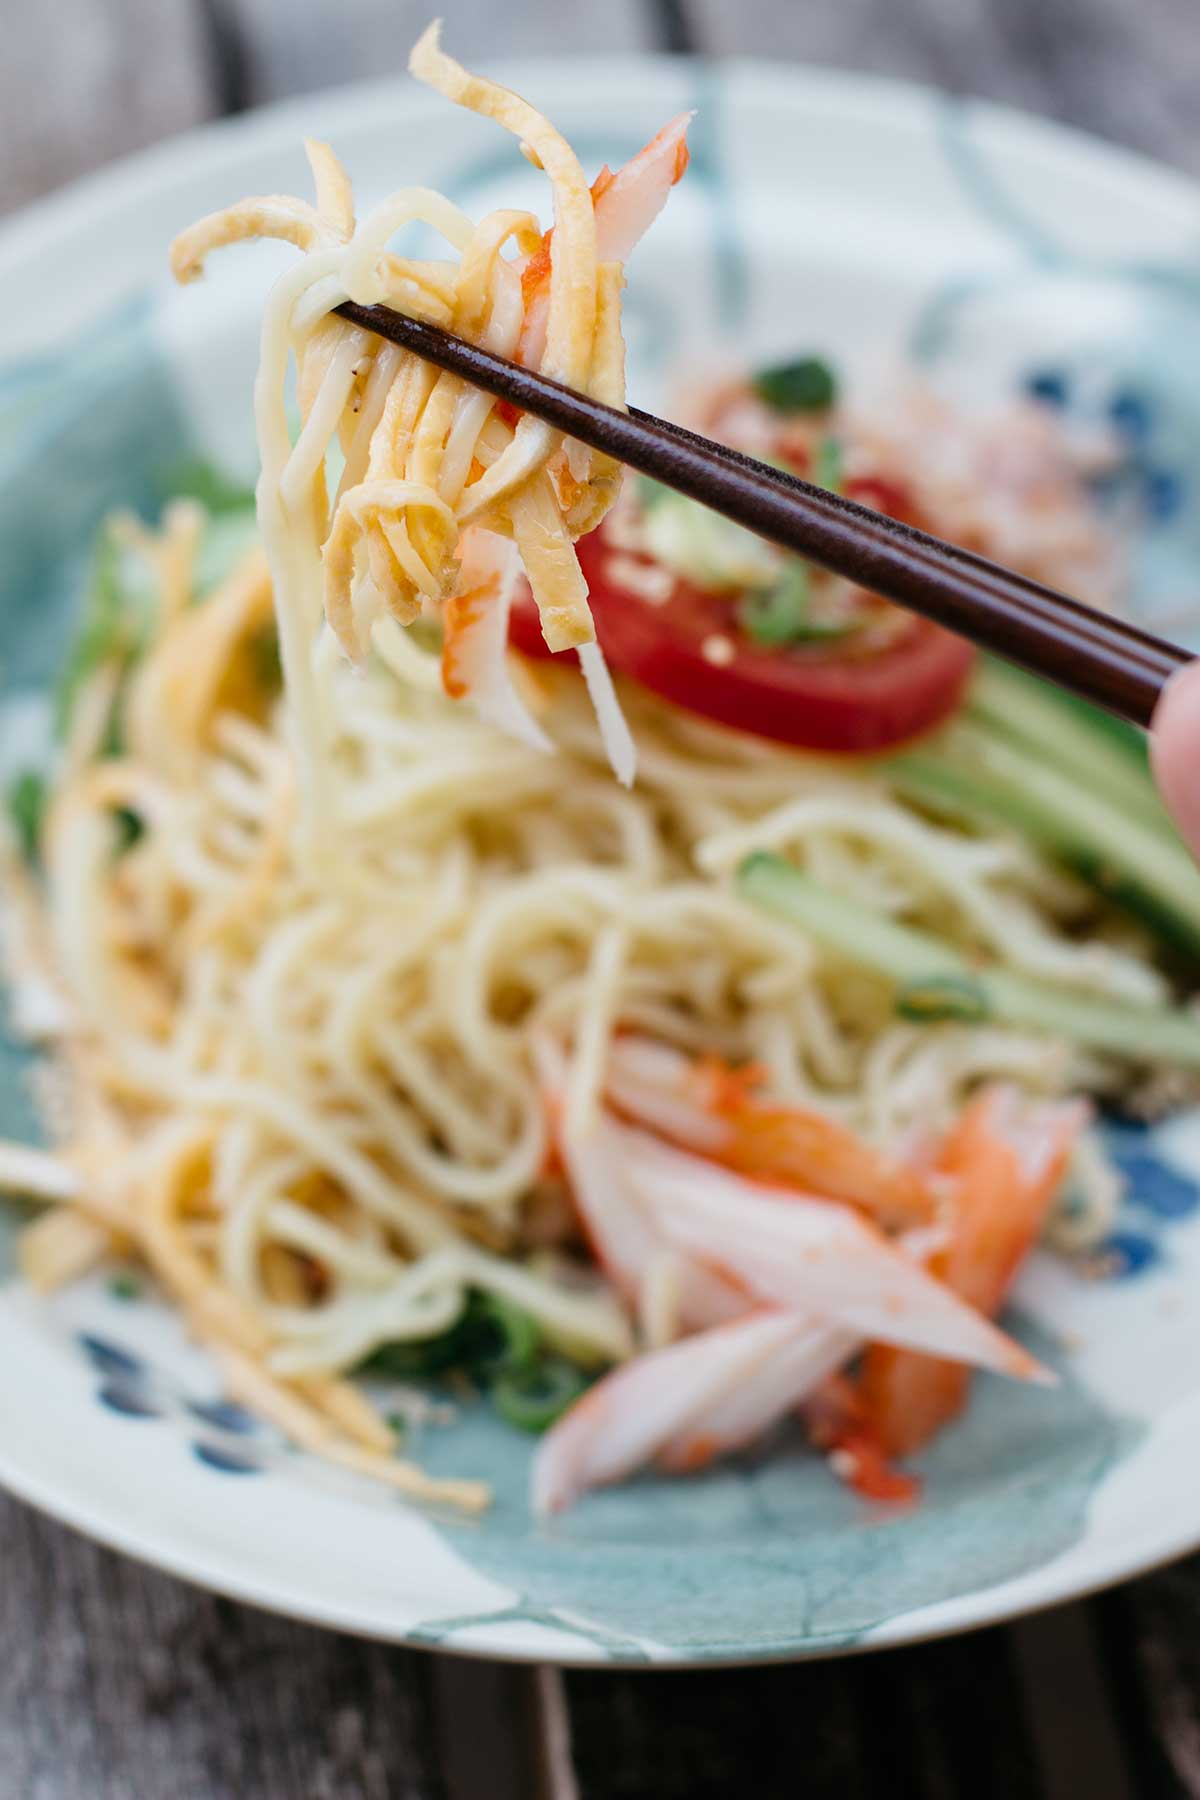 Cold Ramen Salad (Hiyashi Chuka) with Sesame Dressing